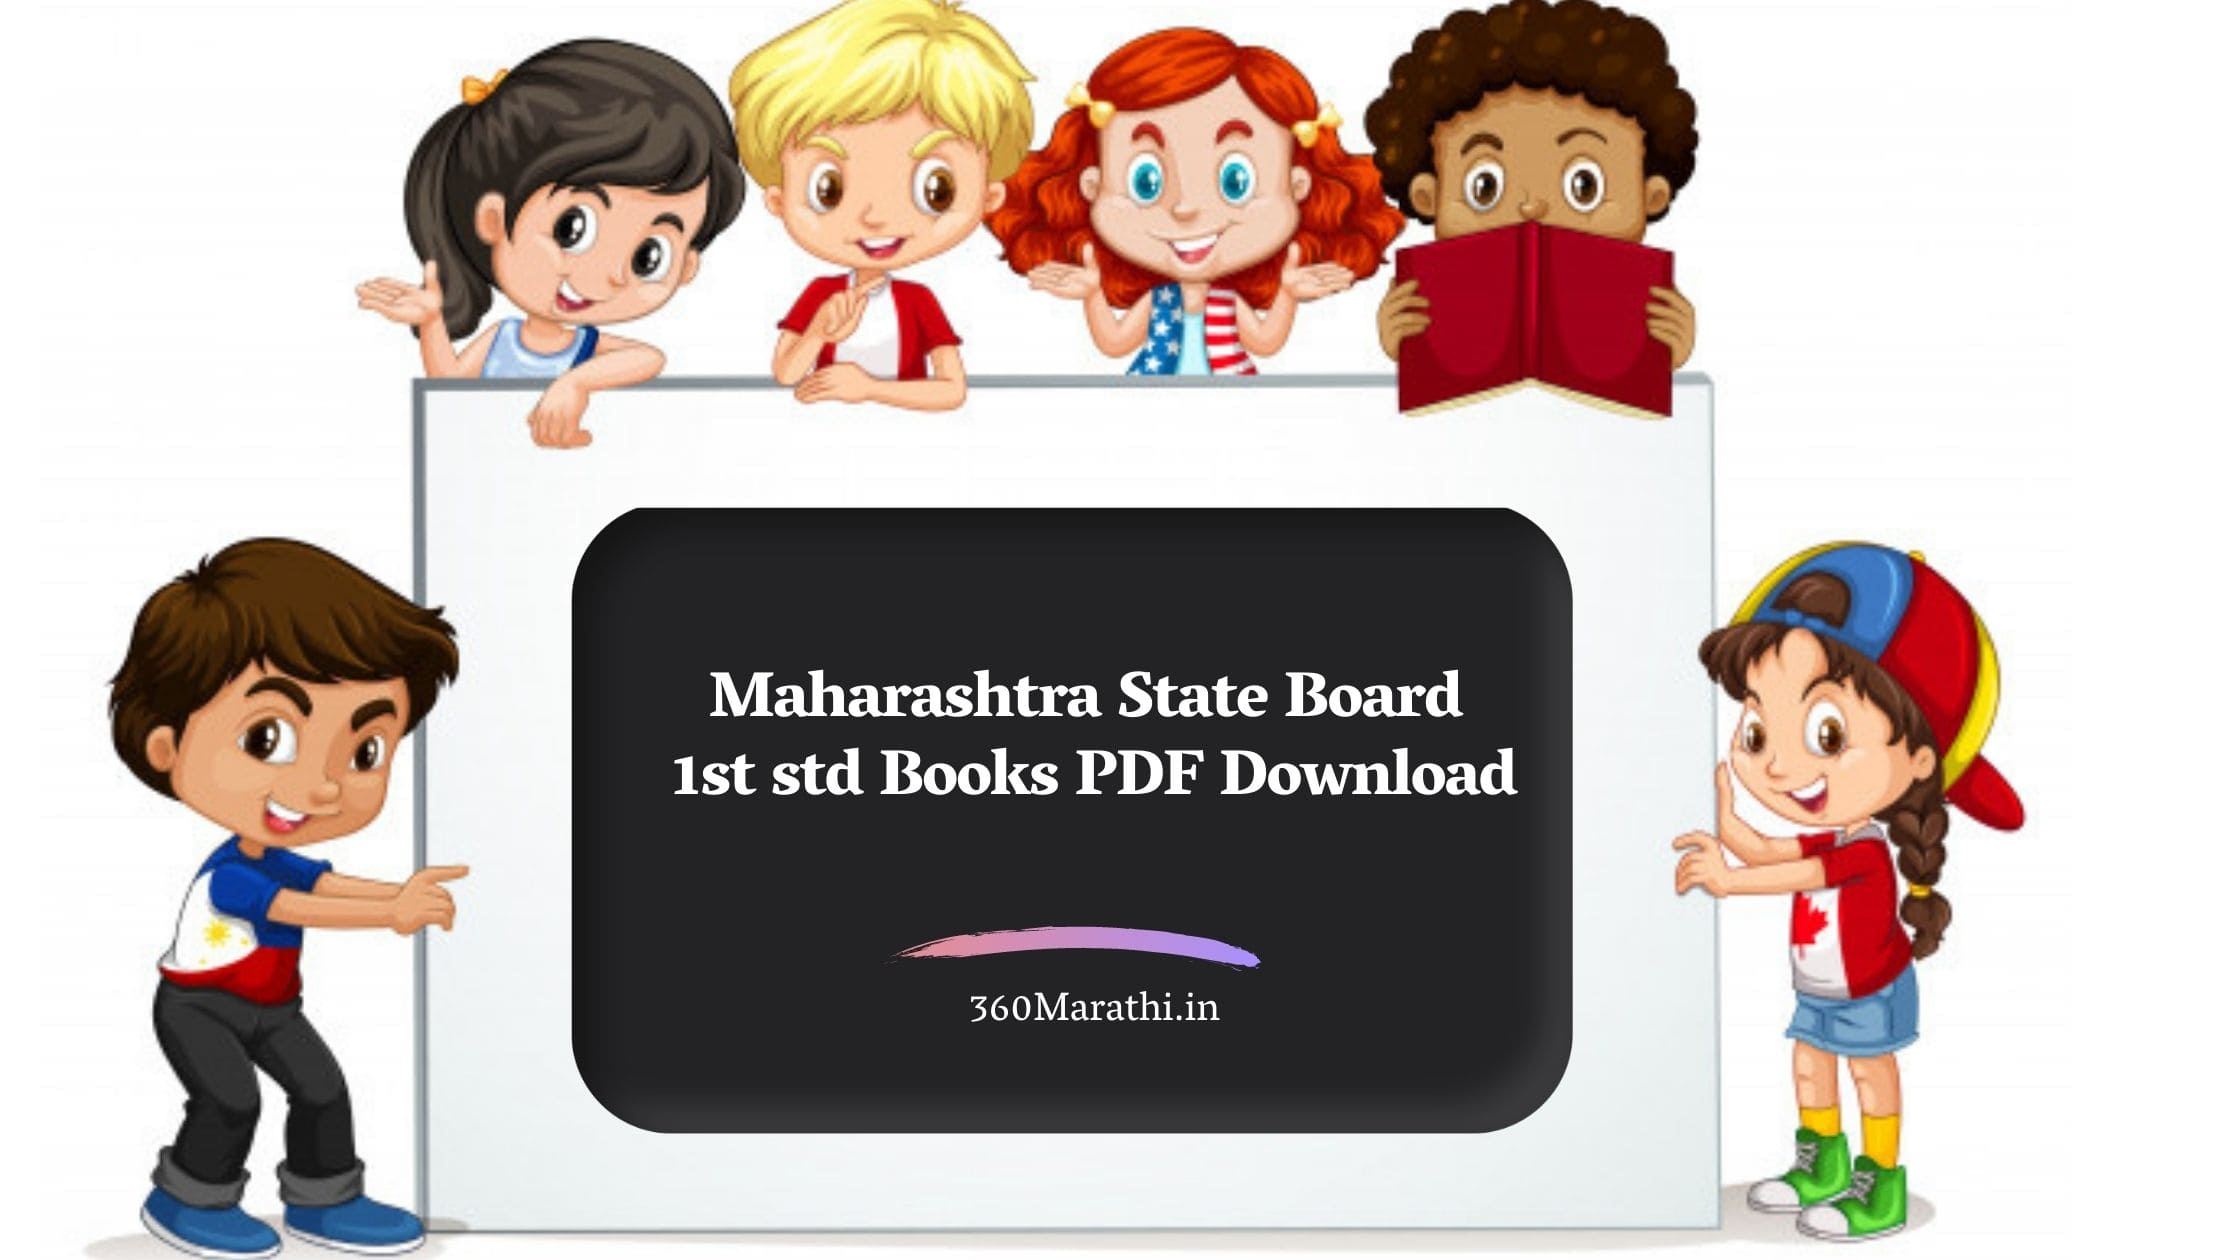 Maharashtra State Board 1st std Books PDF Download